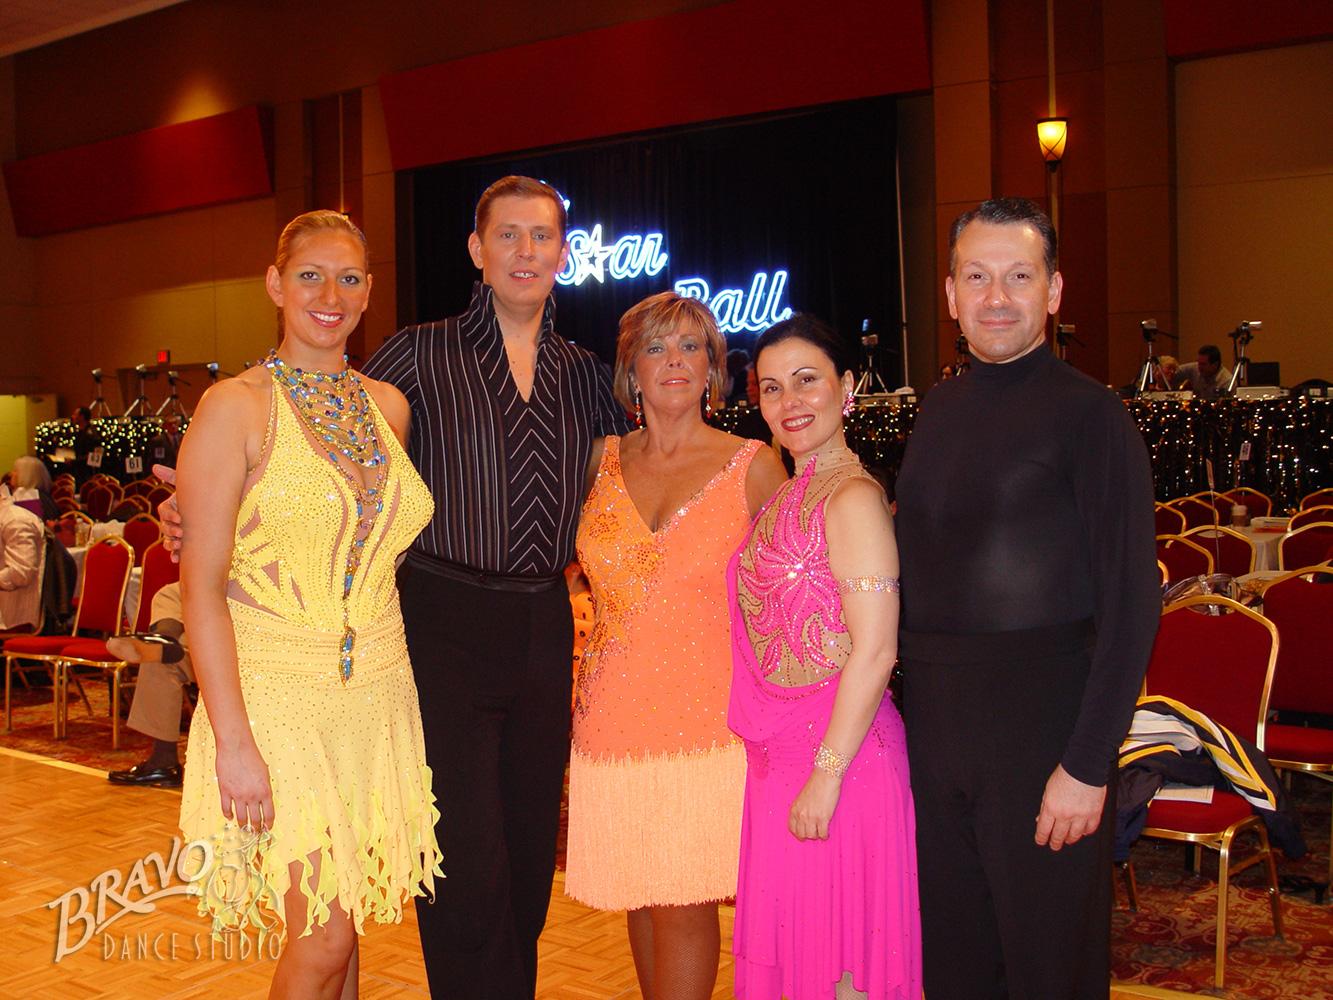 Bravo-Pro-Am-Dancers-1-(5).jpg